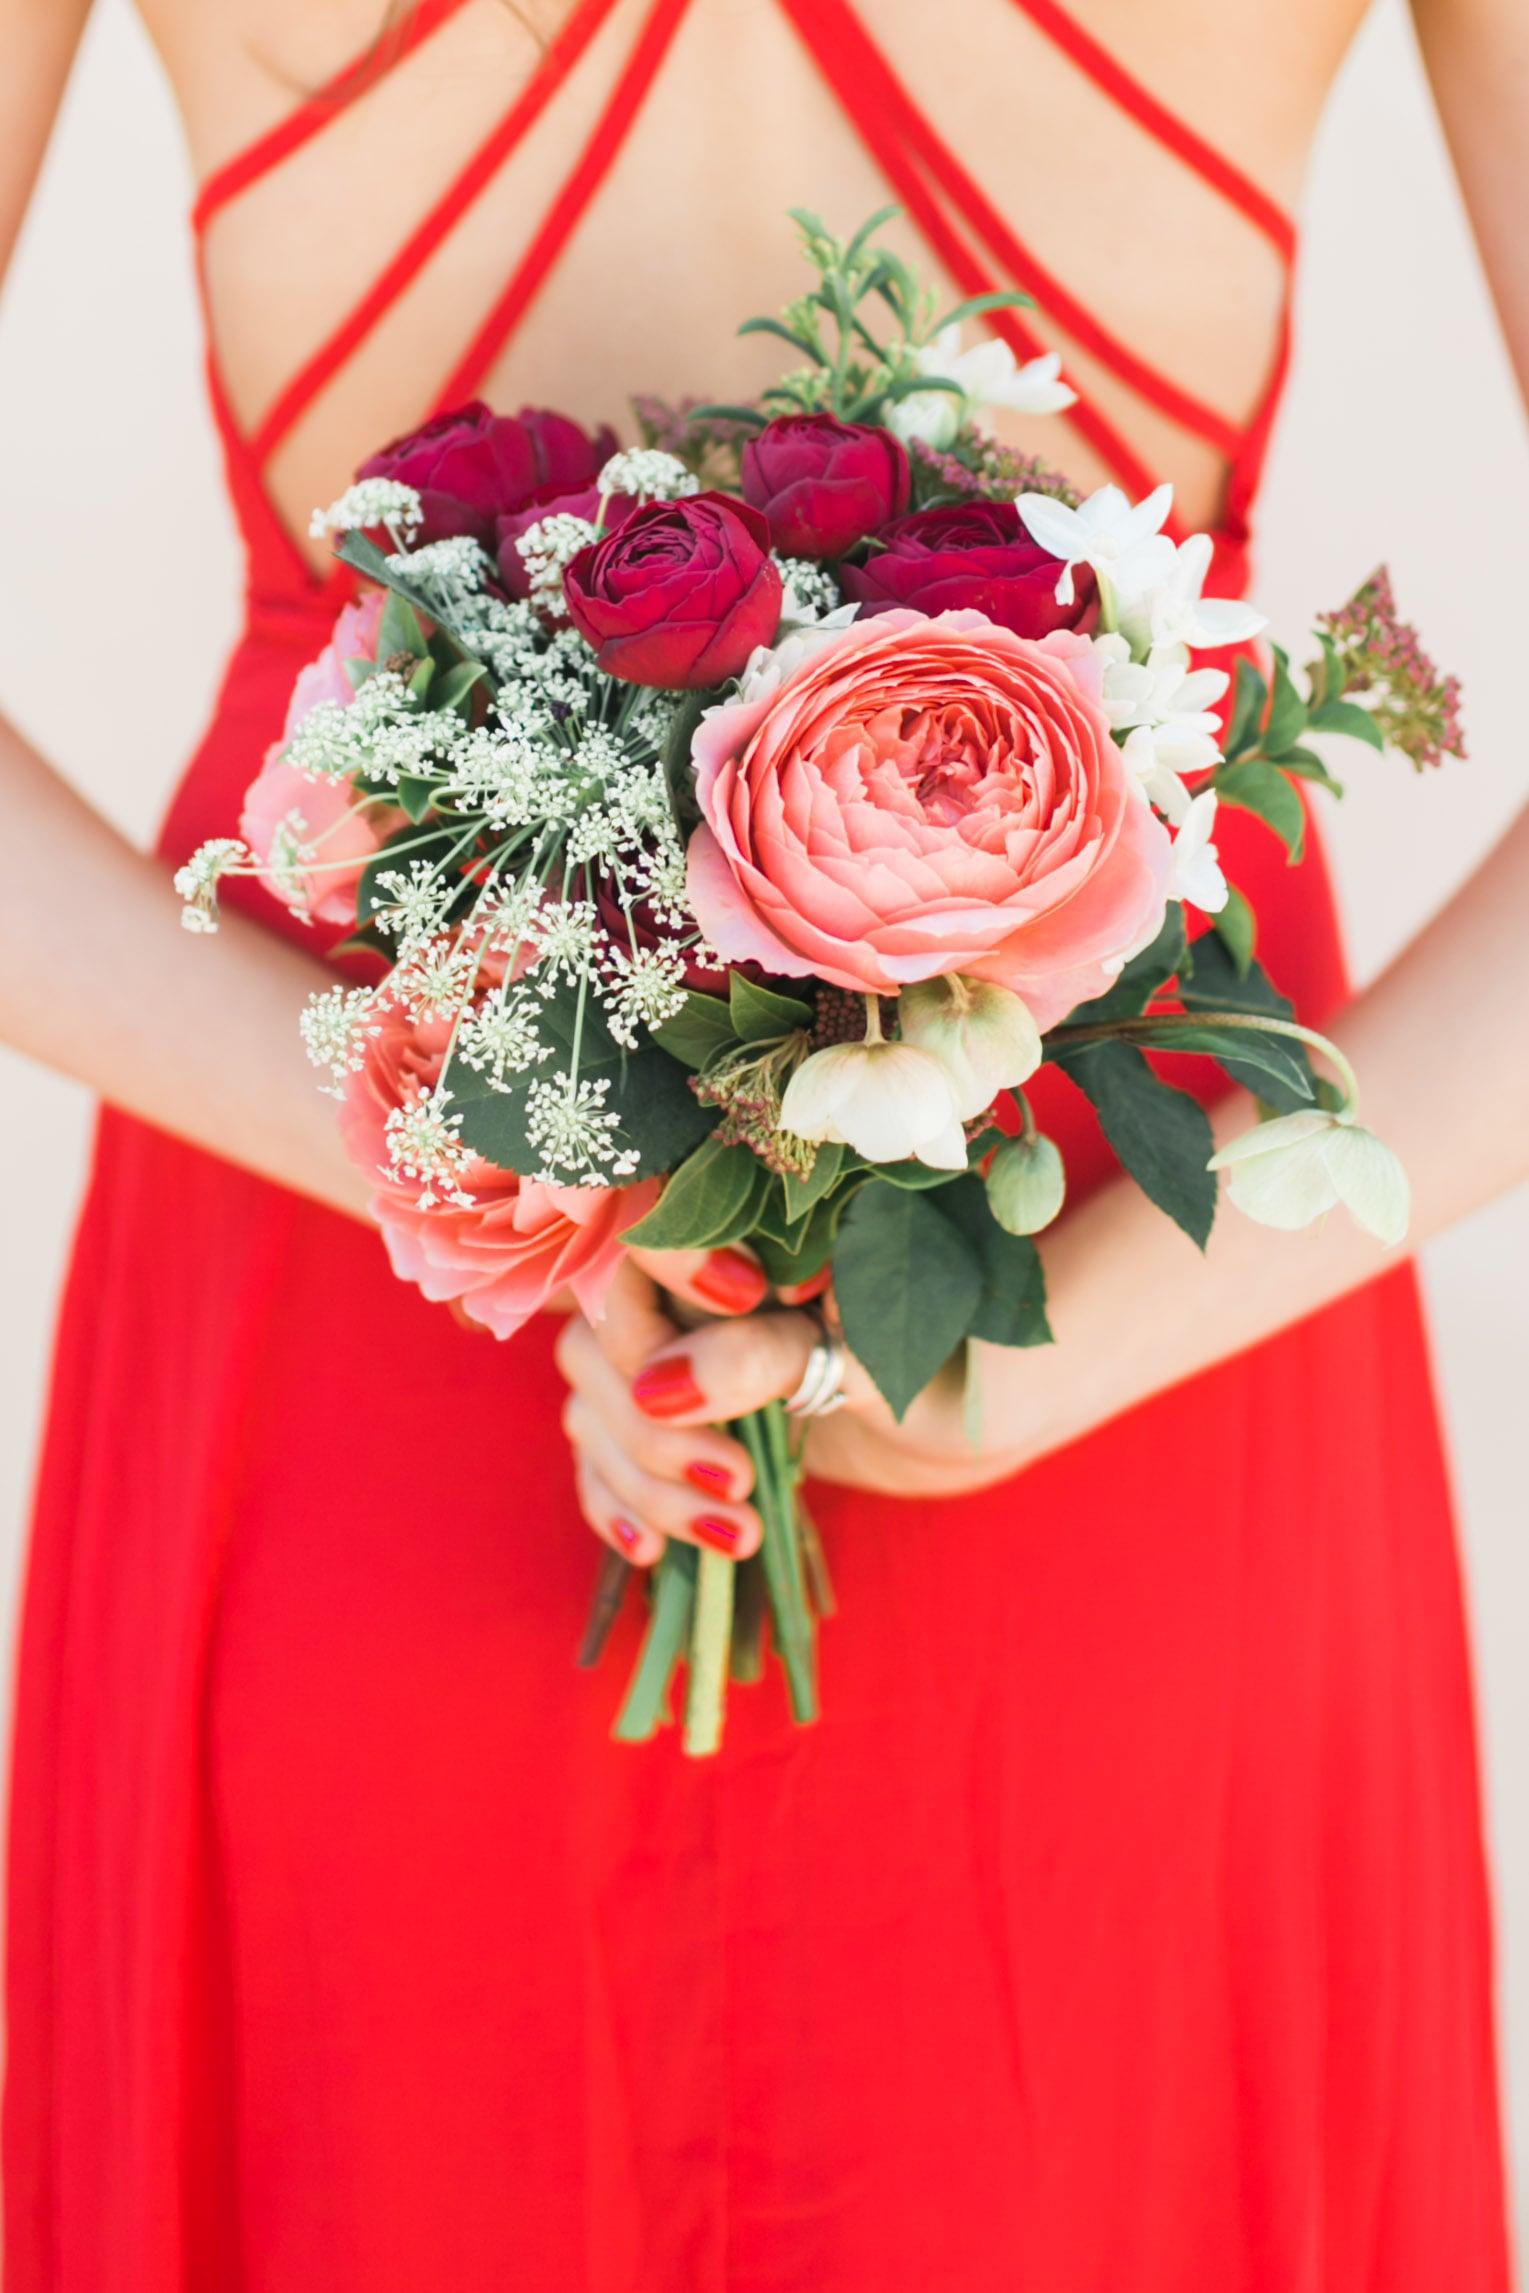 Natalie_Schutt_Photography_Winter_Wedding_San_Luis_Obispo-61.jpg